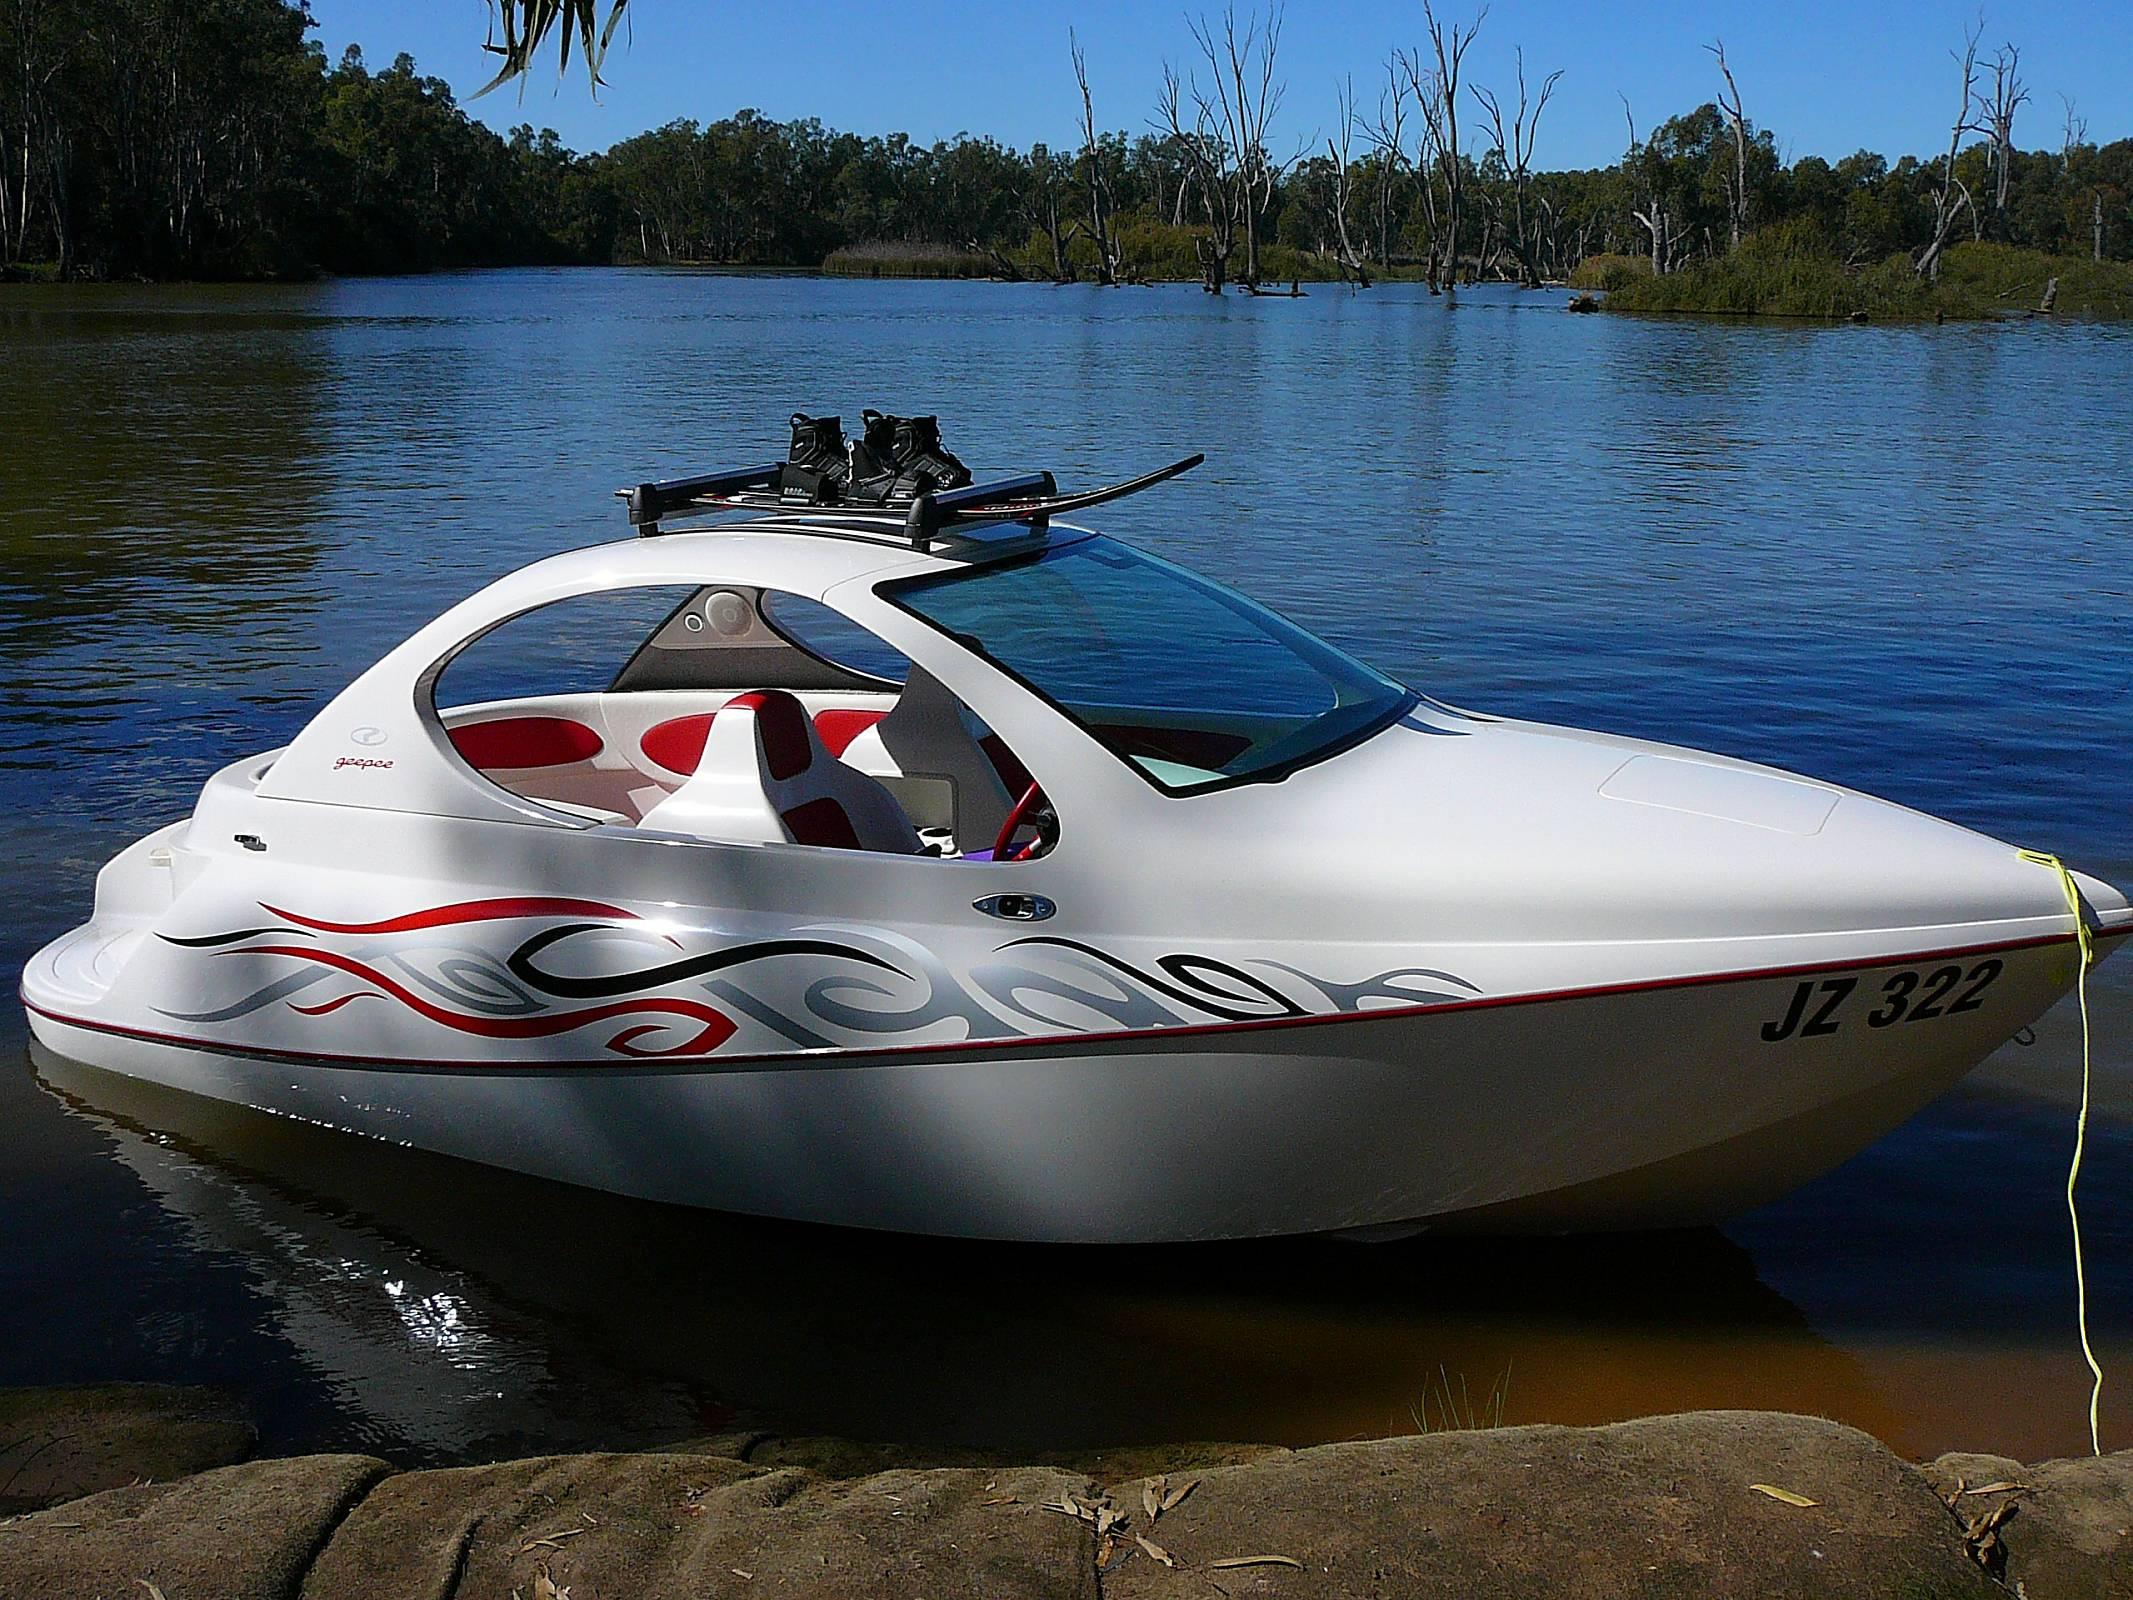 Fish ski leisure whatever 6 metre powerboat molds boat design net p1020203g publicscrutiny Images